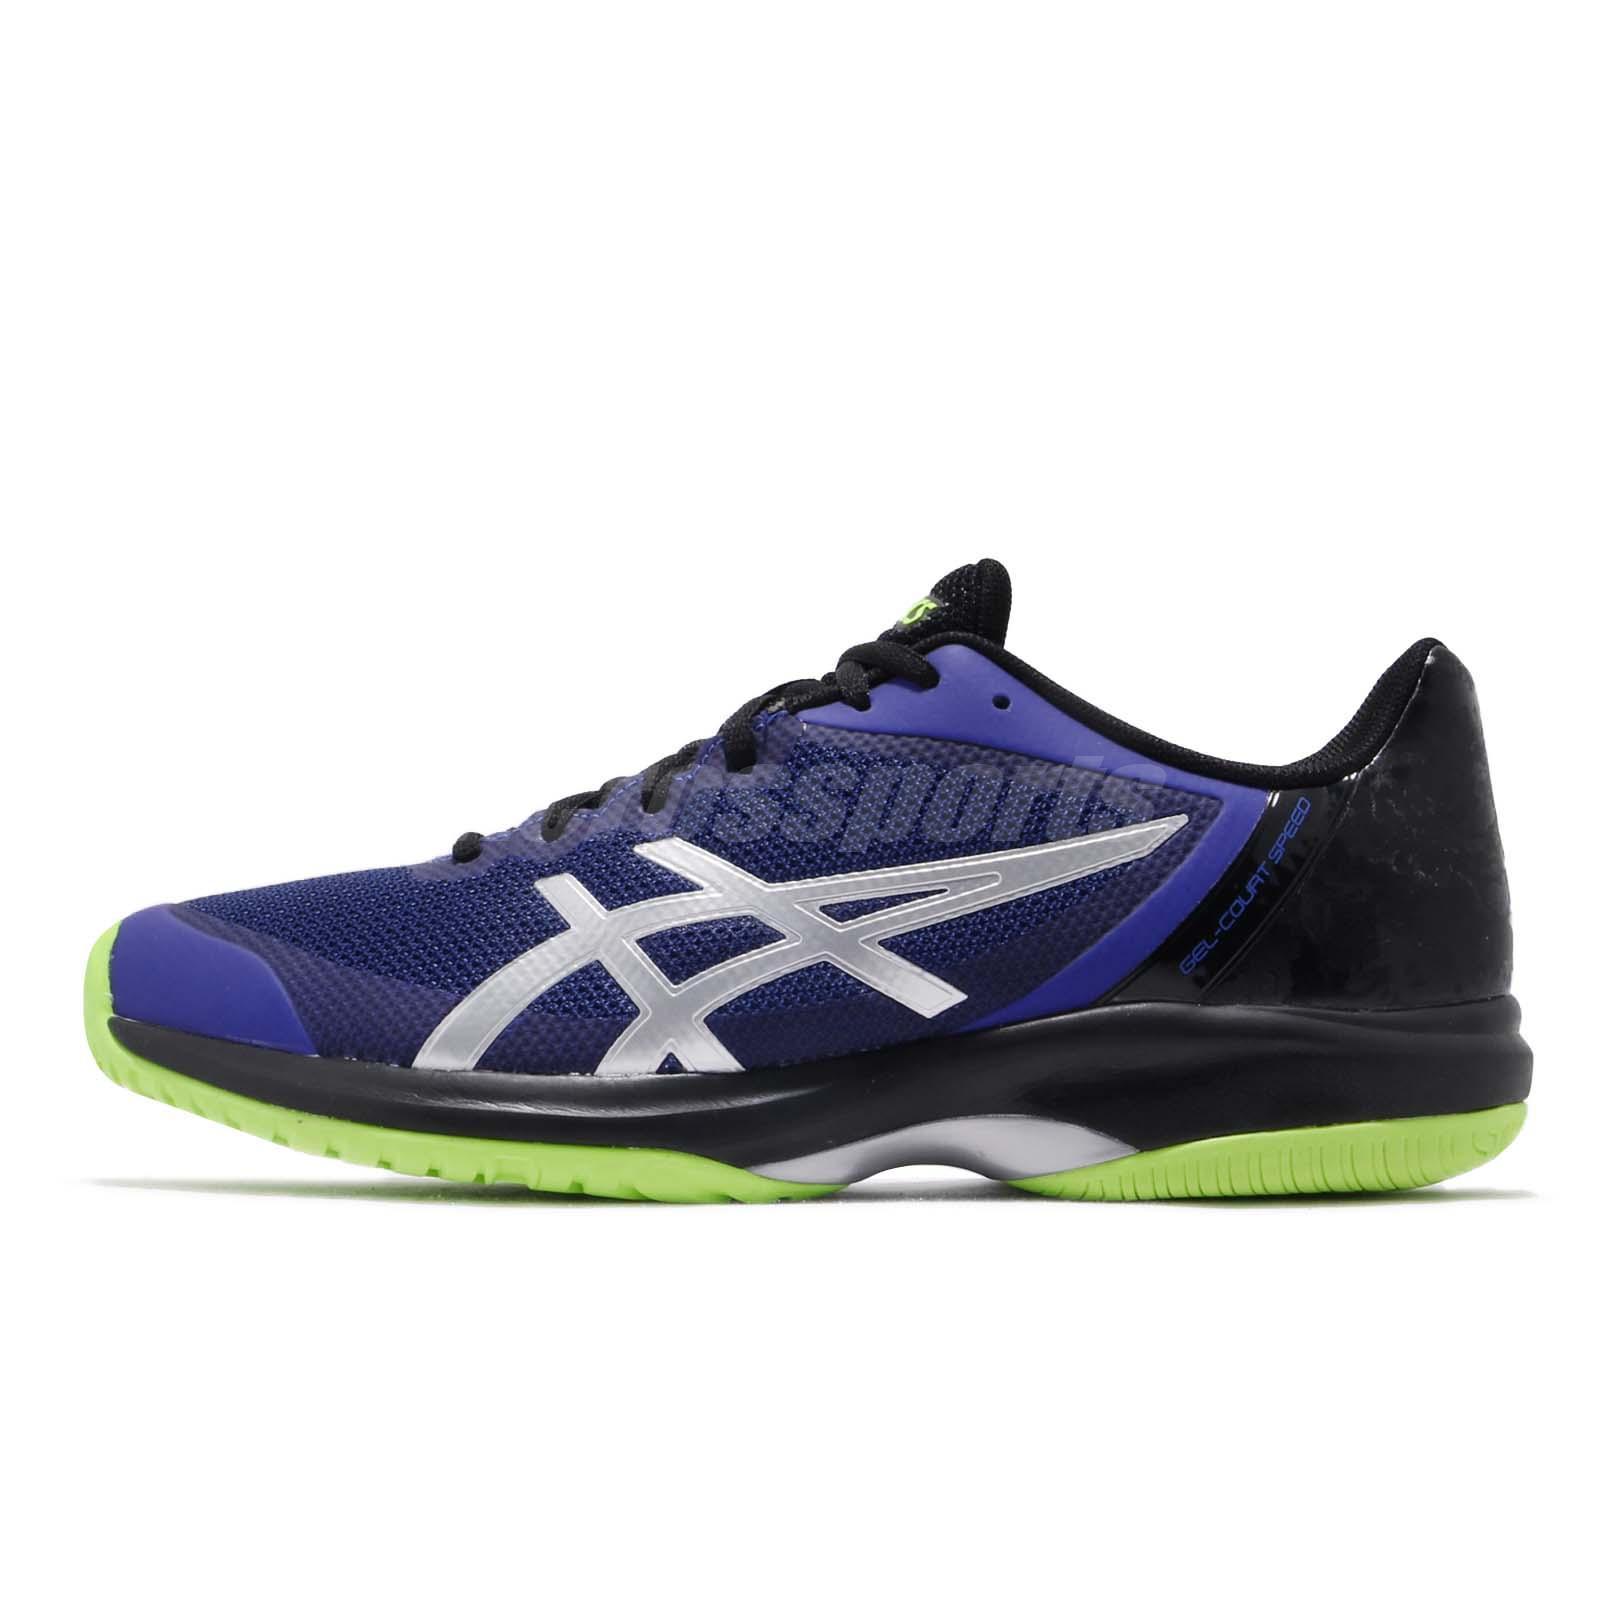 23dffb76f4f7 Asics Gel-Court Speed Blue Silver Black Men Tennis Shoes Sneakers E800N-410